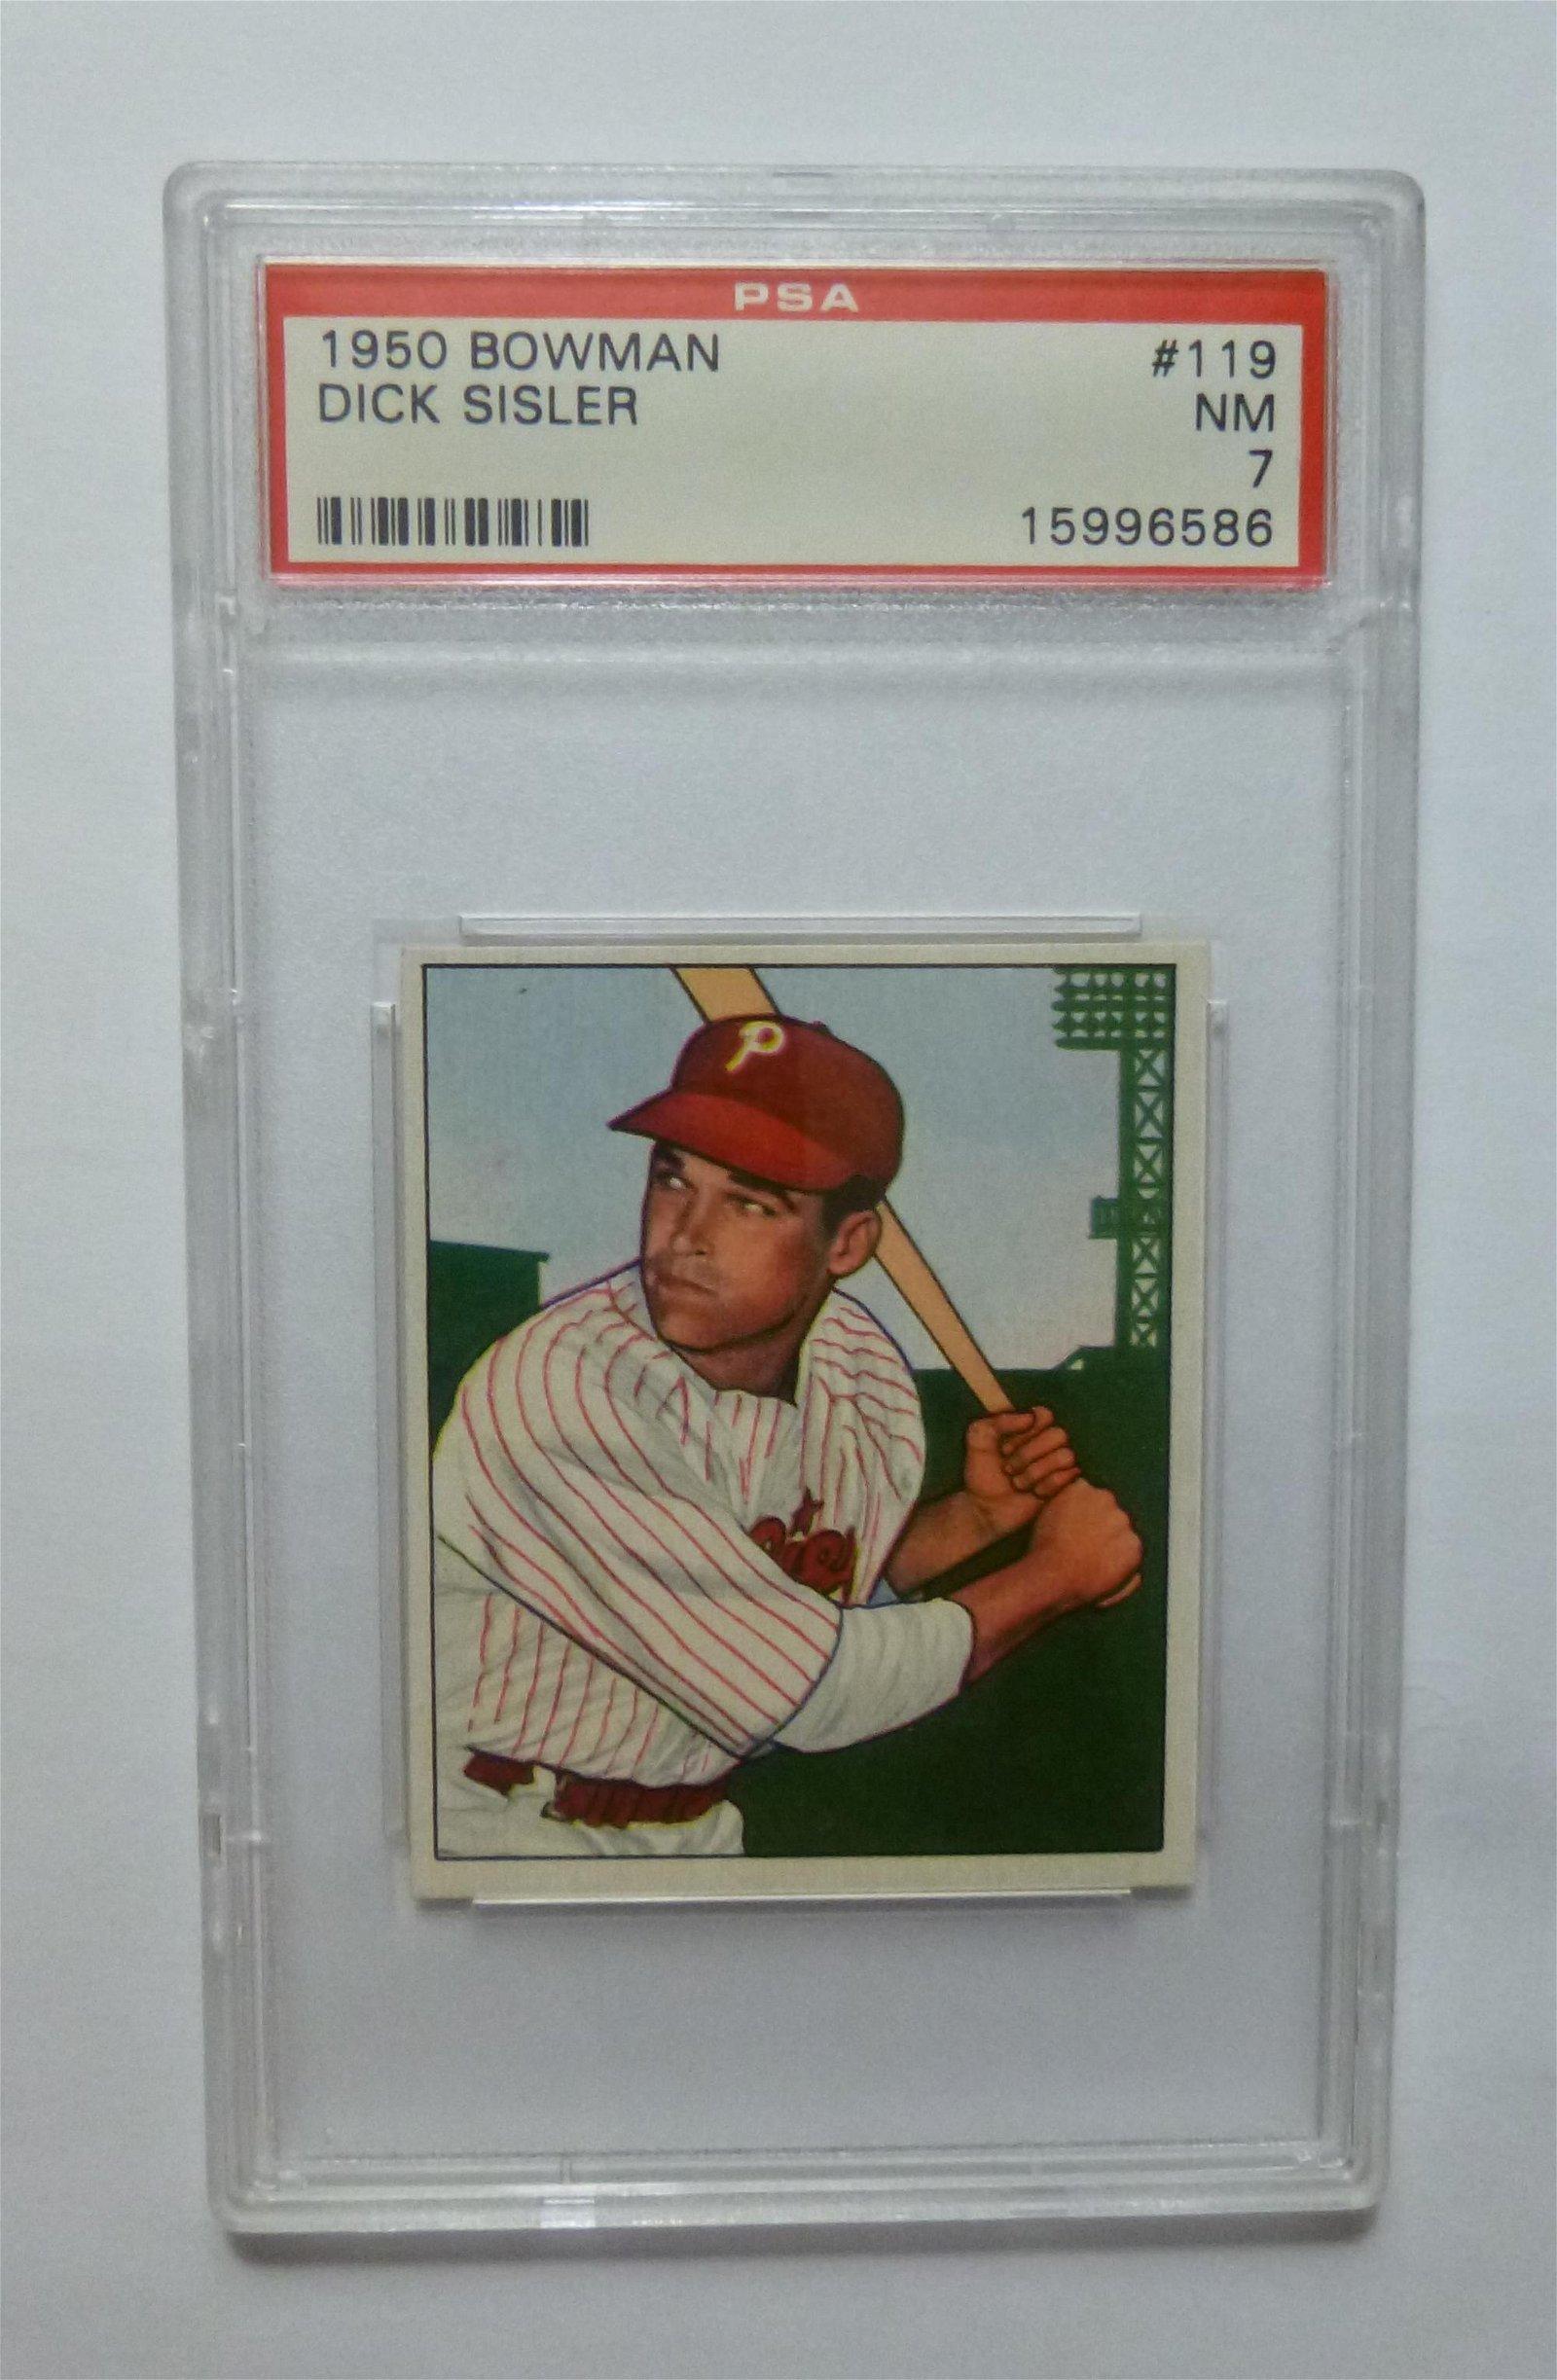 1950 Bowman #119 Dick Sisler PSA 7